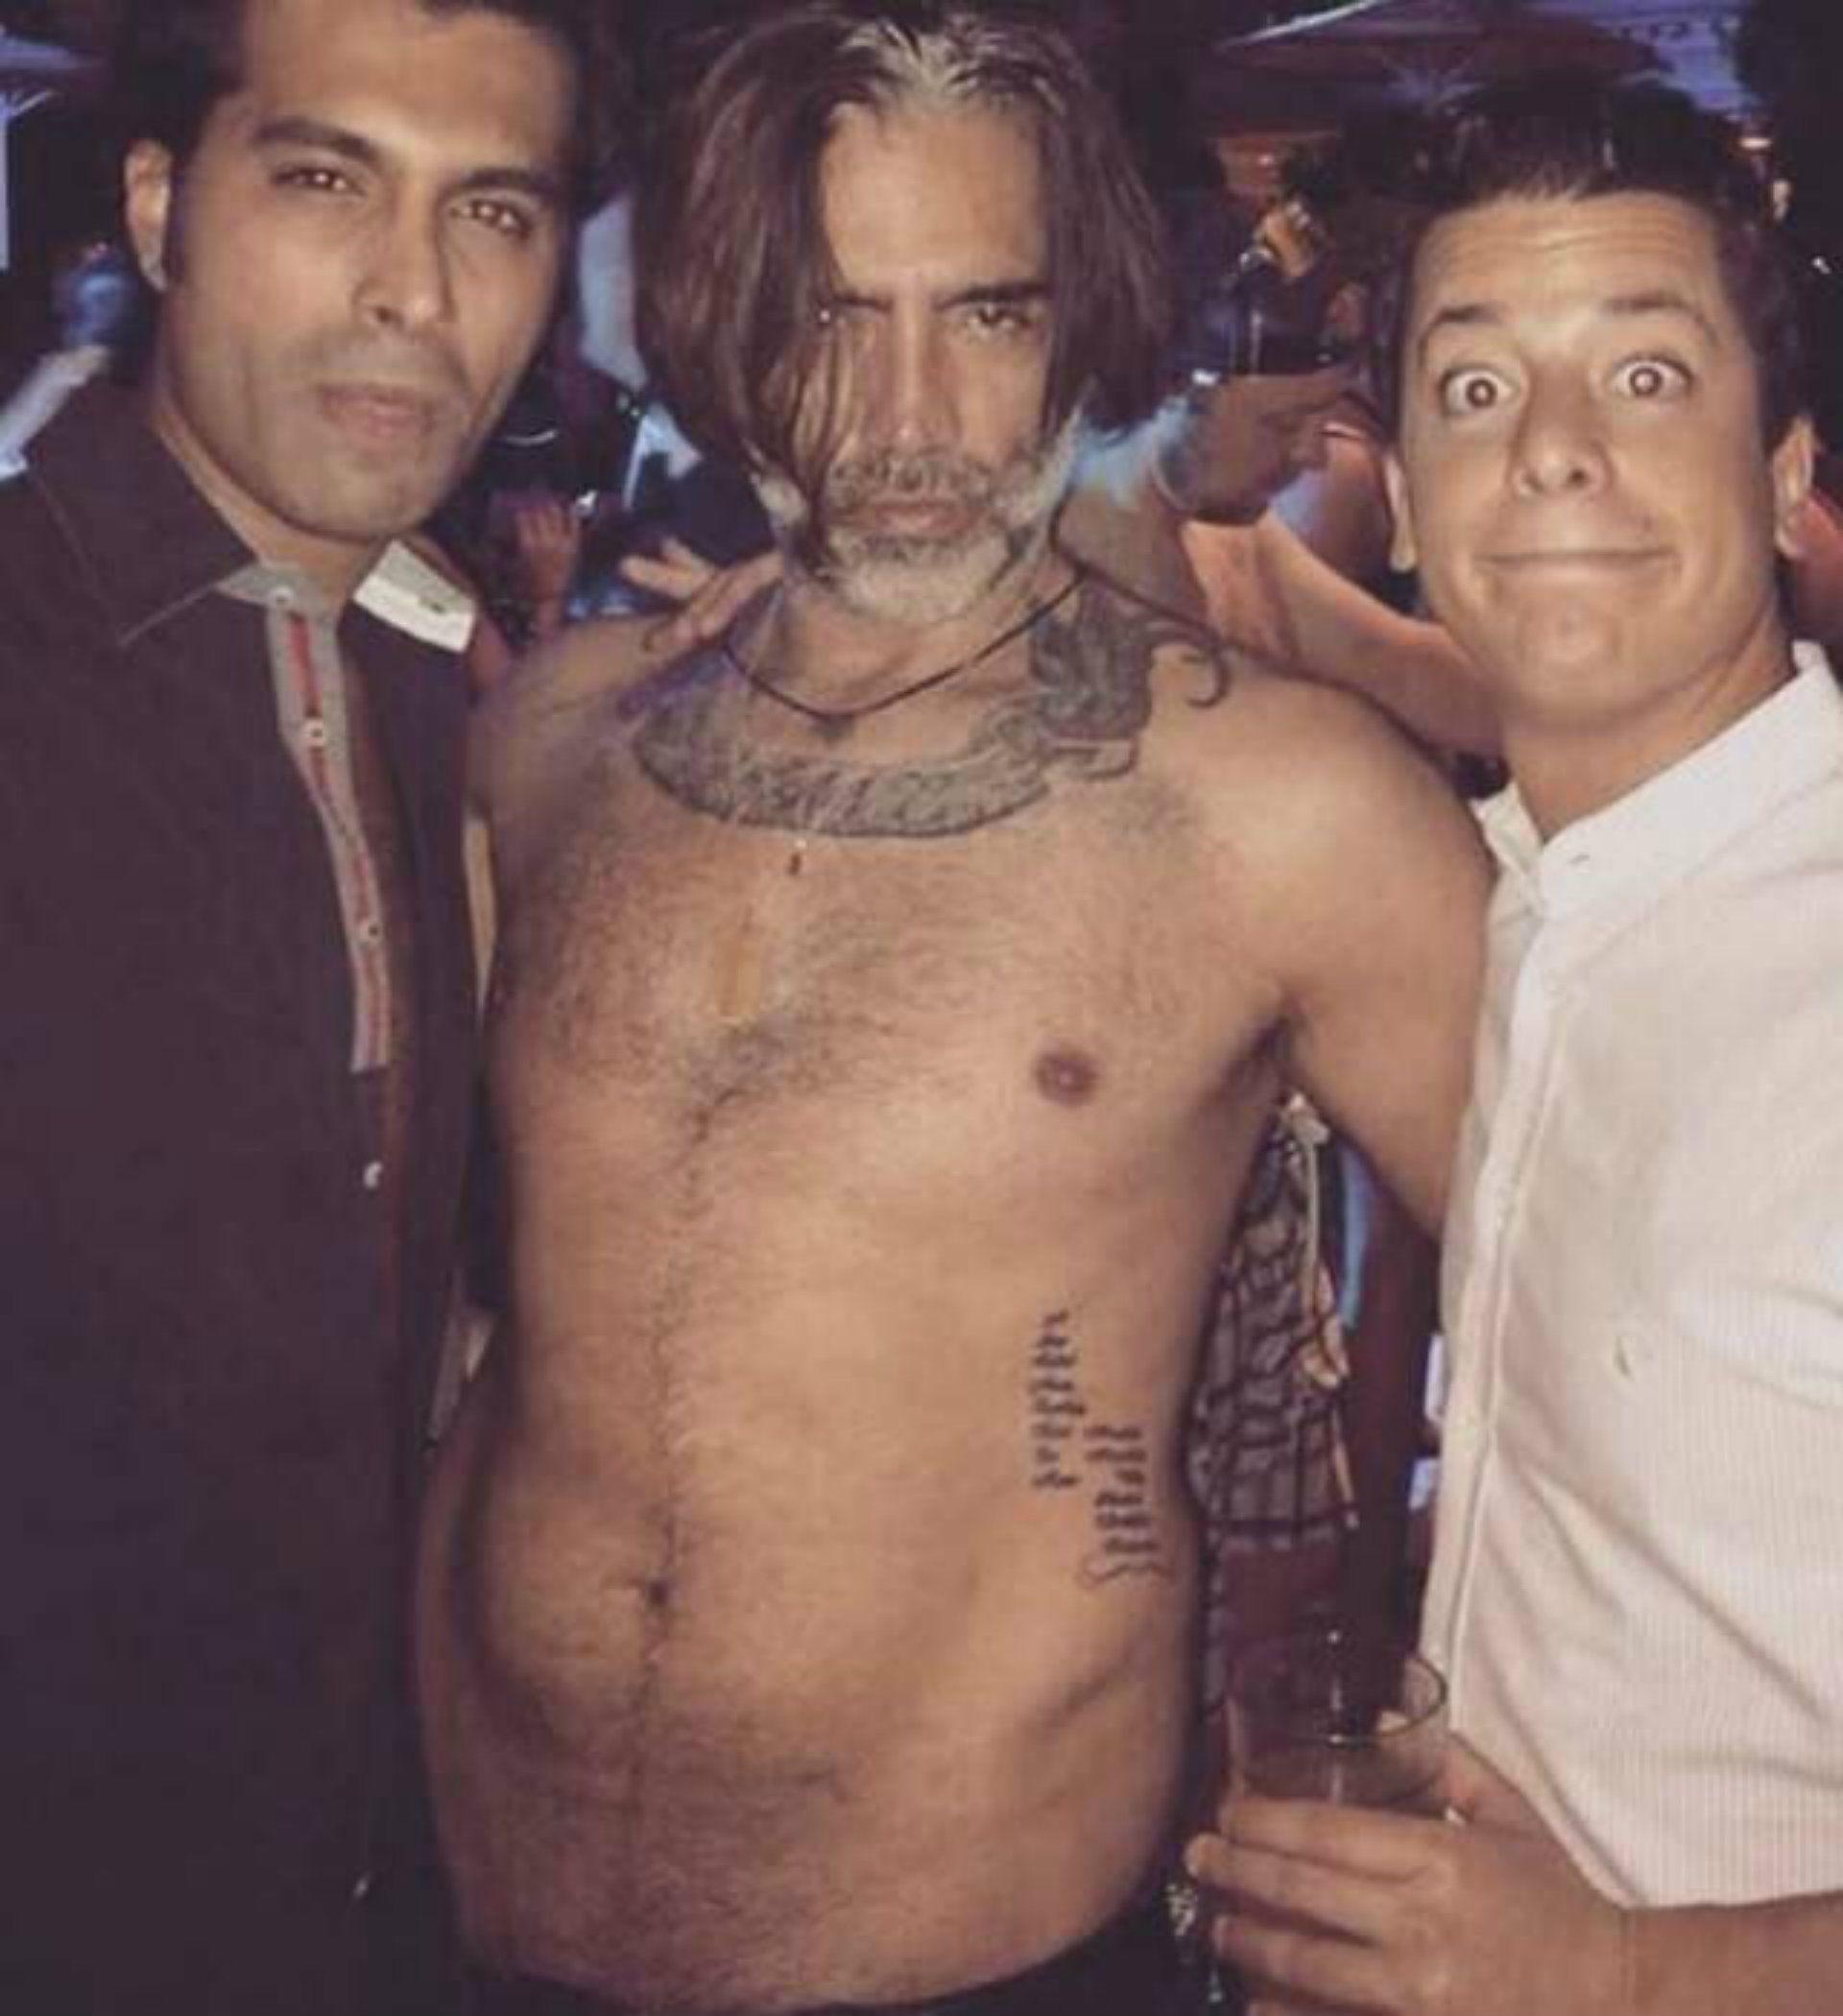 La foto de Alejandro Fernández en Las Vegas que se hizo viral (Foto: Archivo)